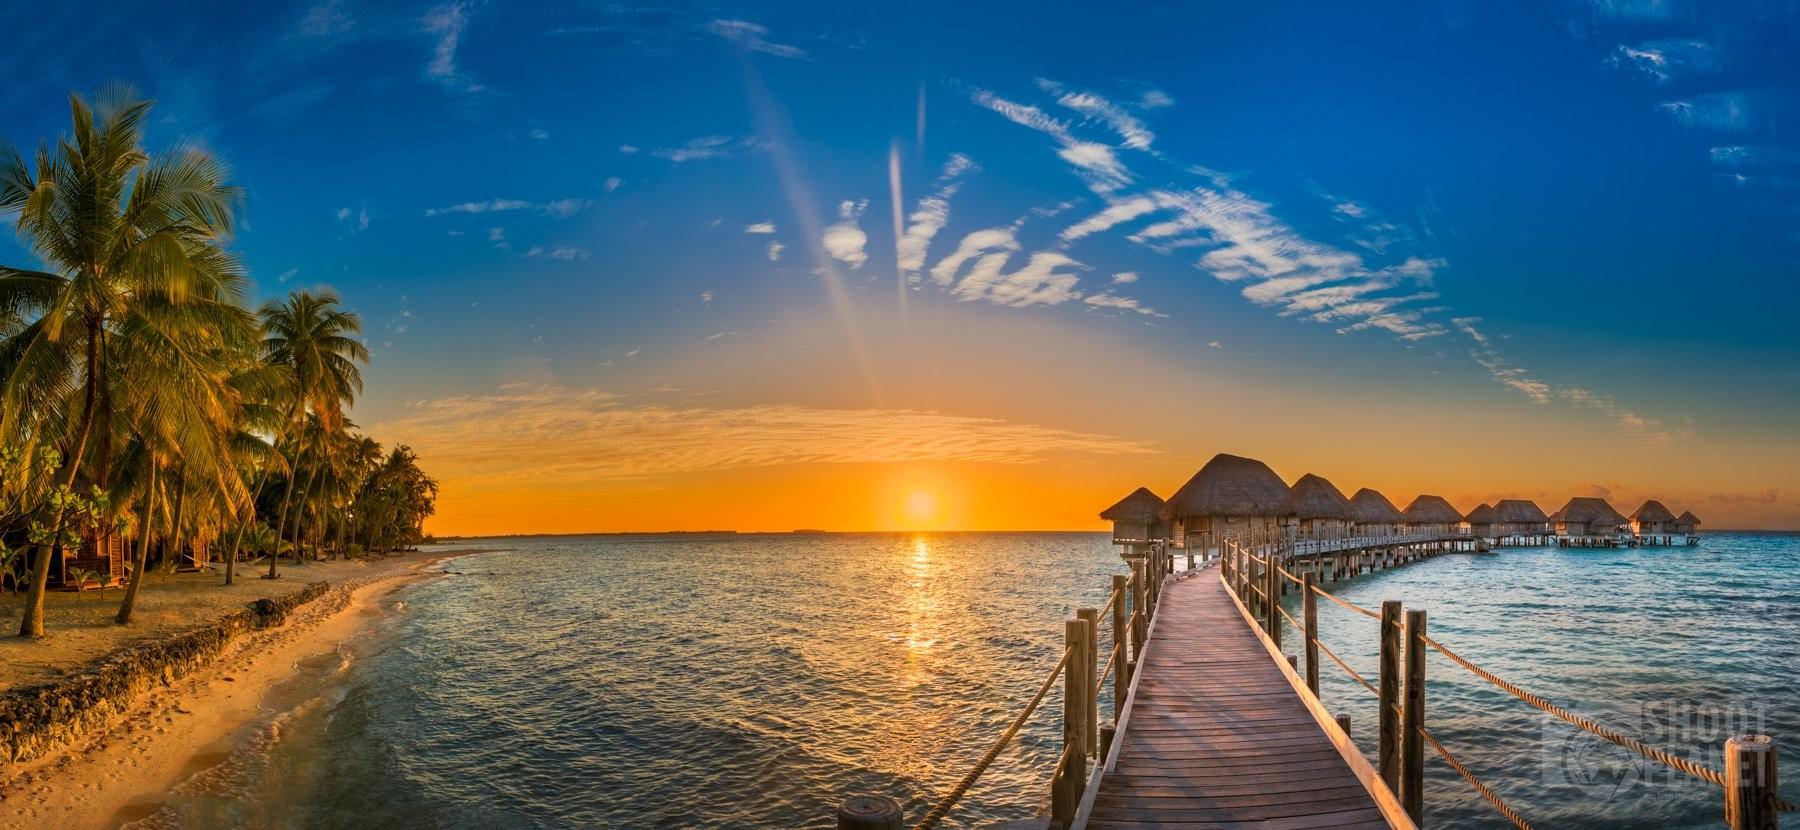 beach and overwater bungalows sunset, Tikehau Polynesia